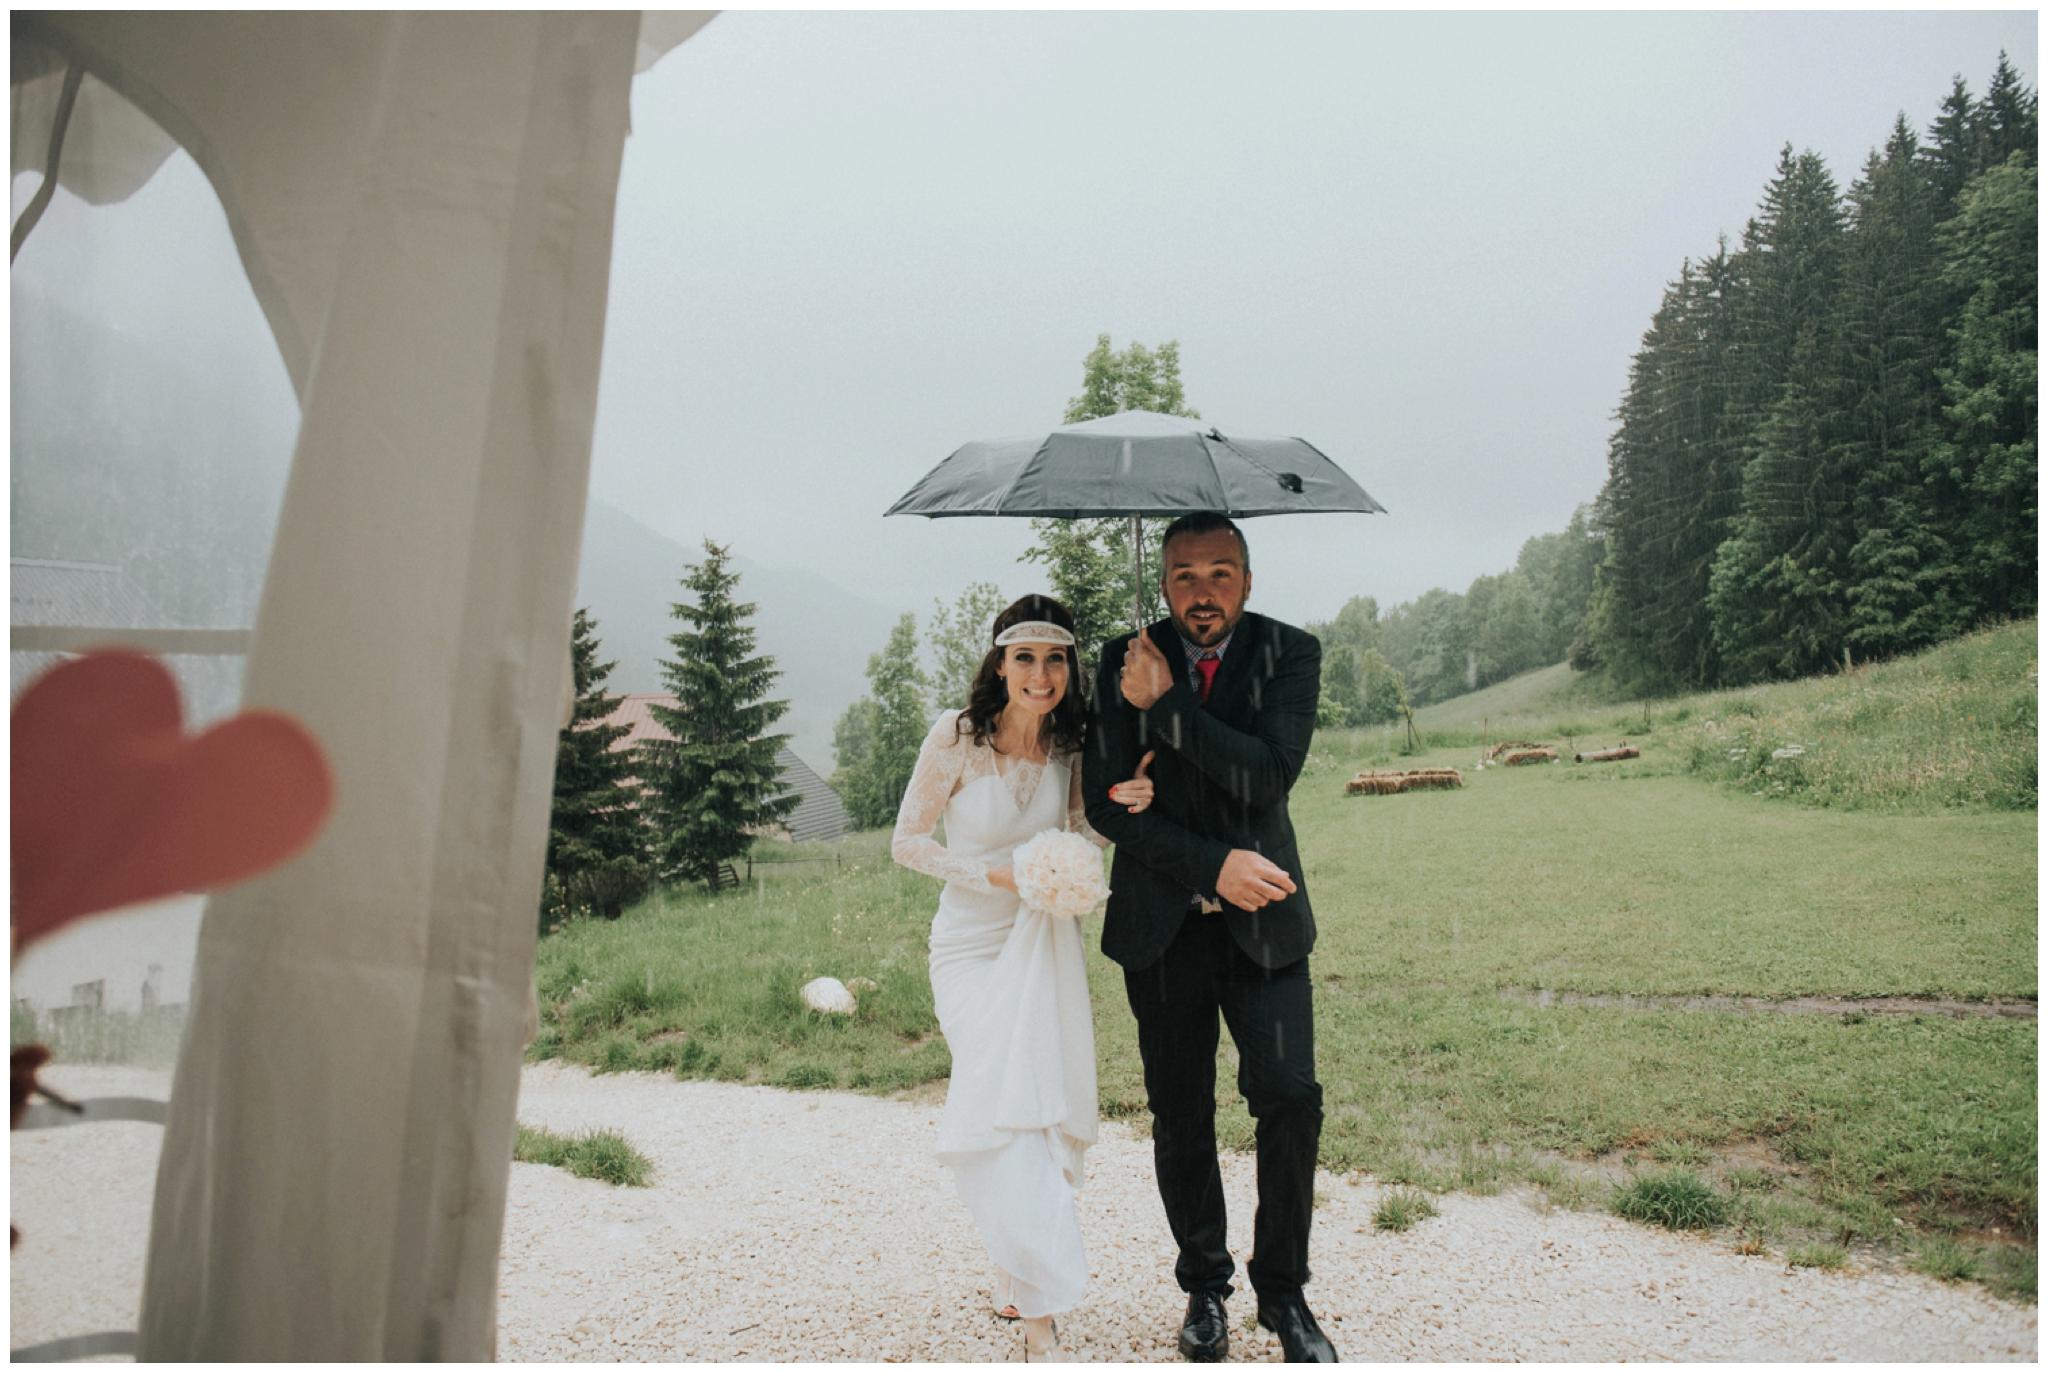 photographe-mariage-montagne-vercors-boho-folk-grenoble-annecy-alpes_0045